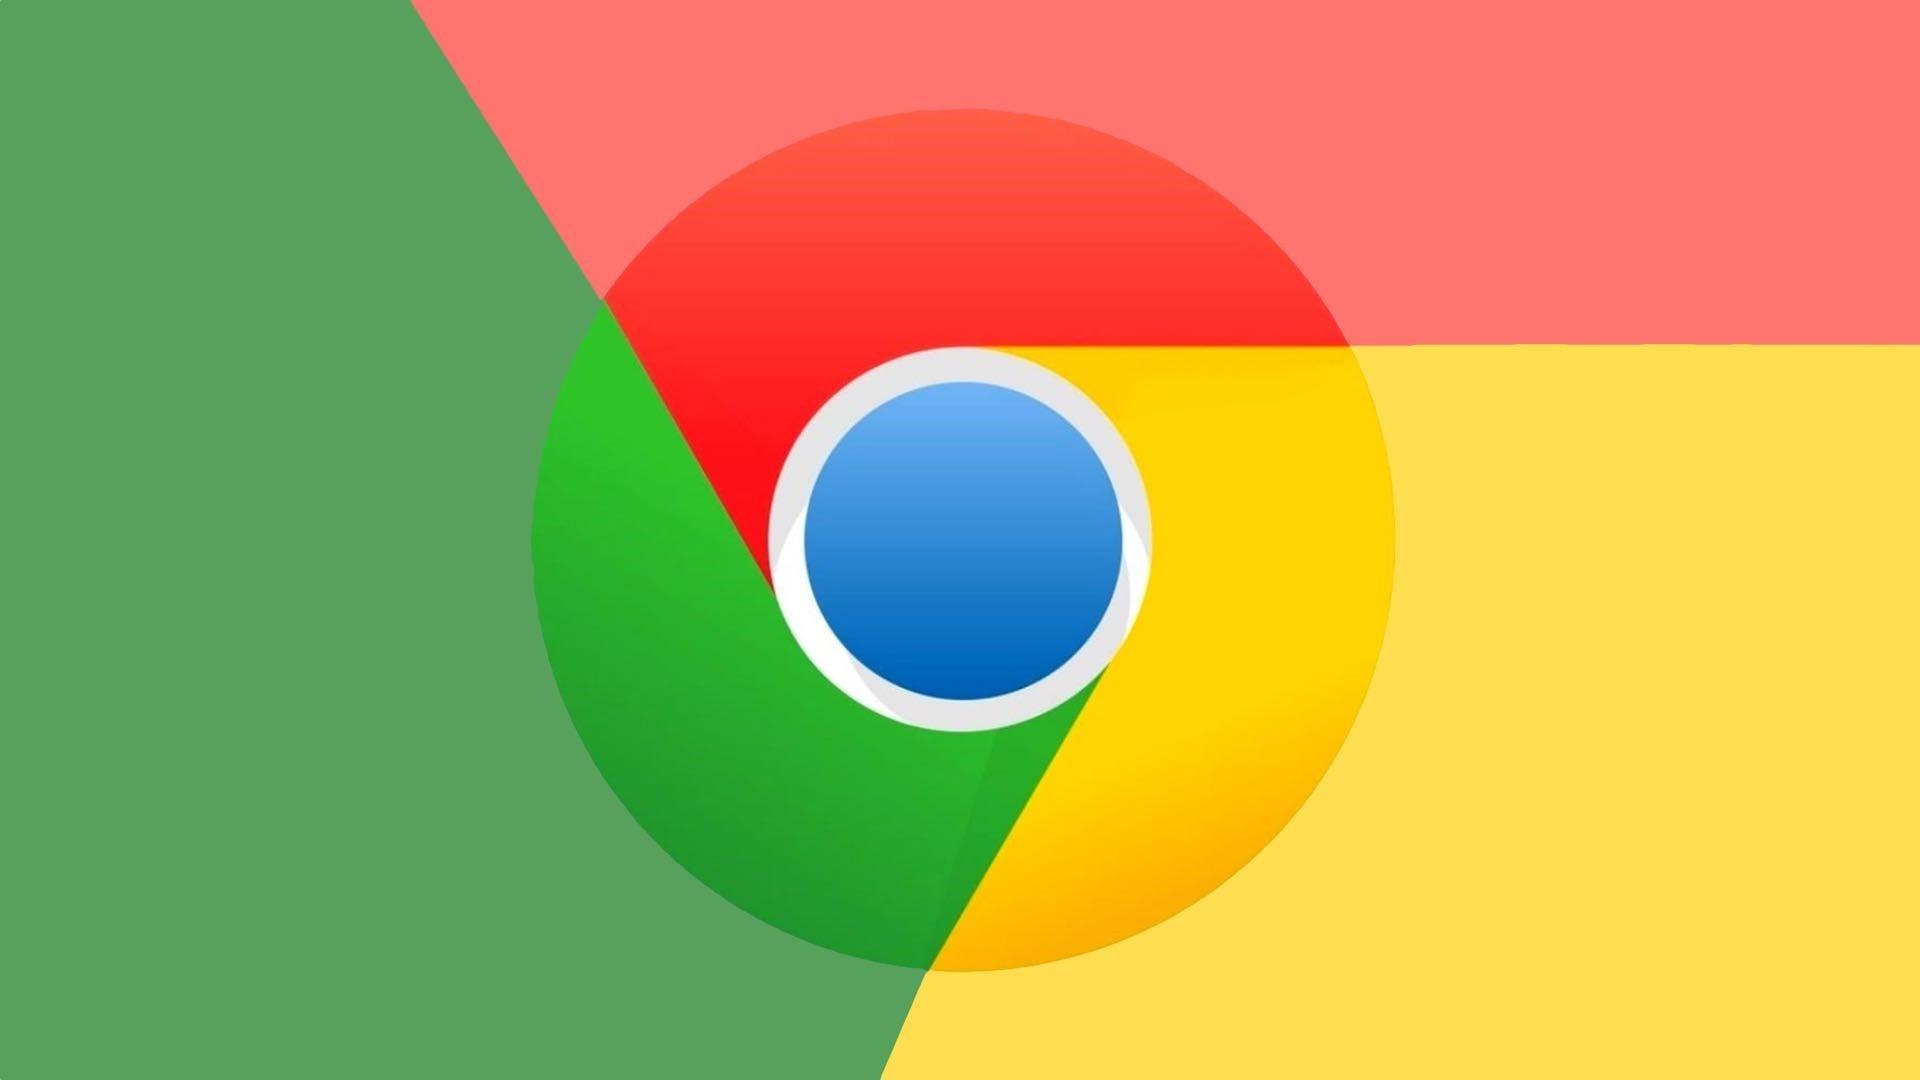 Chrome Wallpaper theme